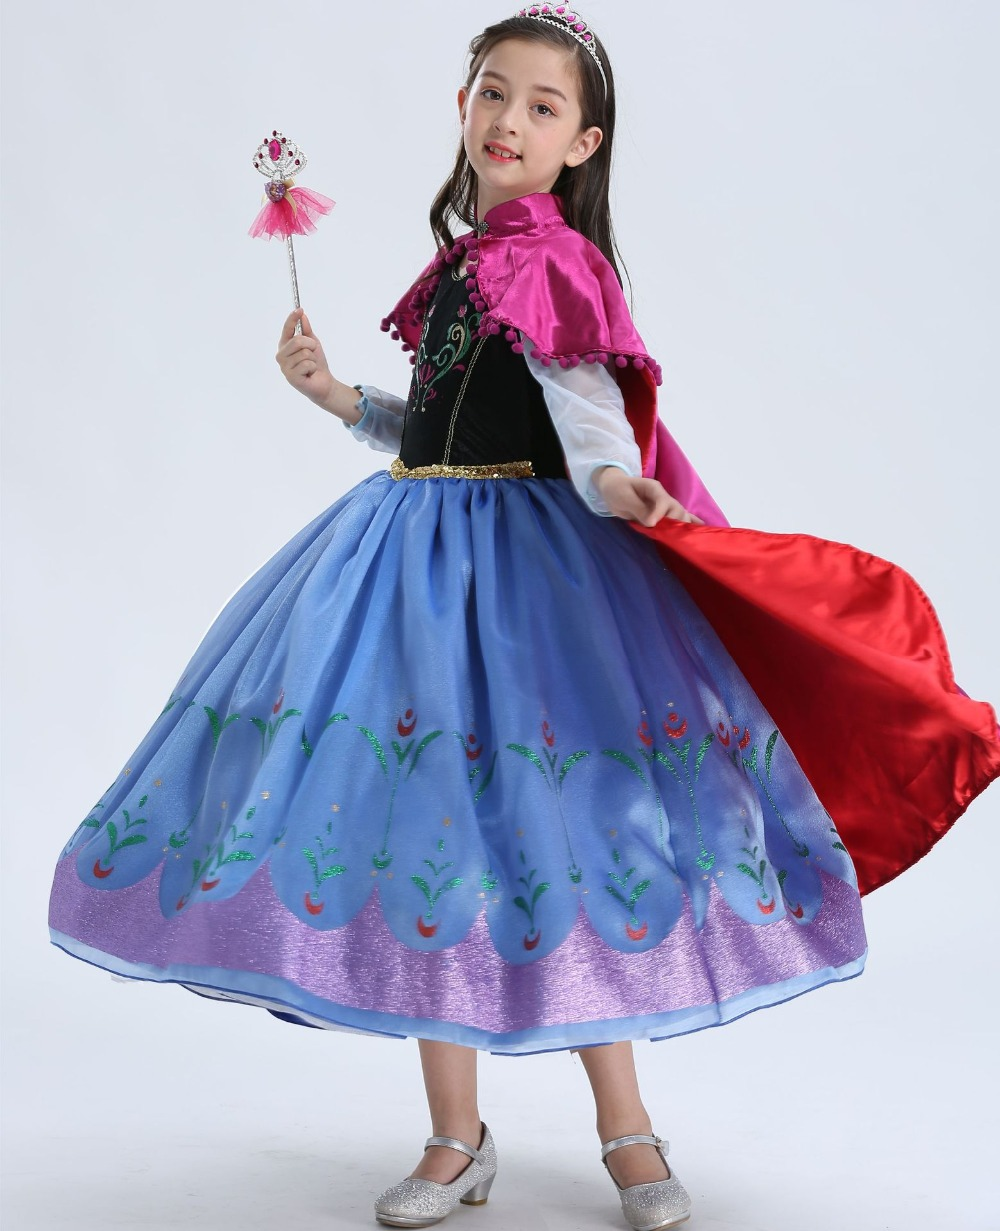 Sofia Princess Dress Kids Cosplay Costumes Girls New Arrival: 2018 New Birthday Anna Dress Girls Party Vestidos Cosplay